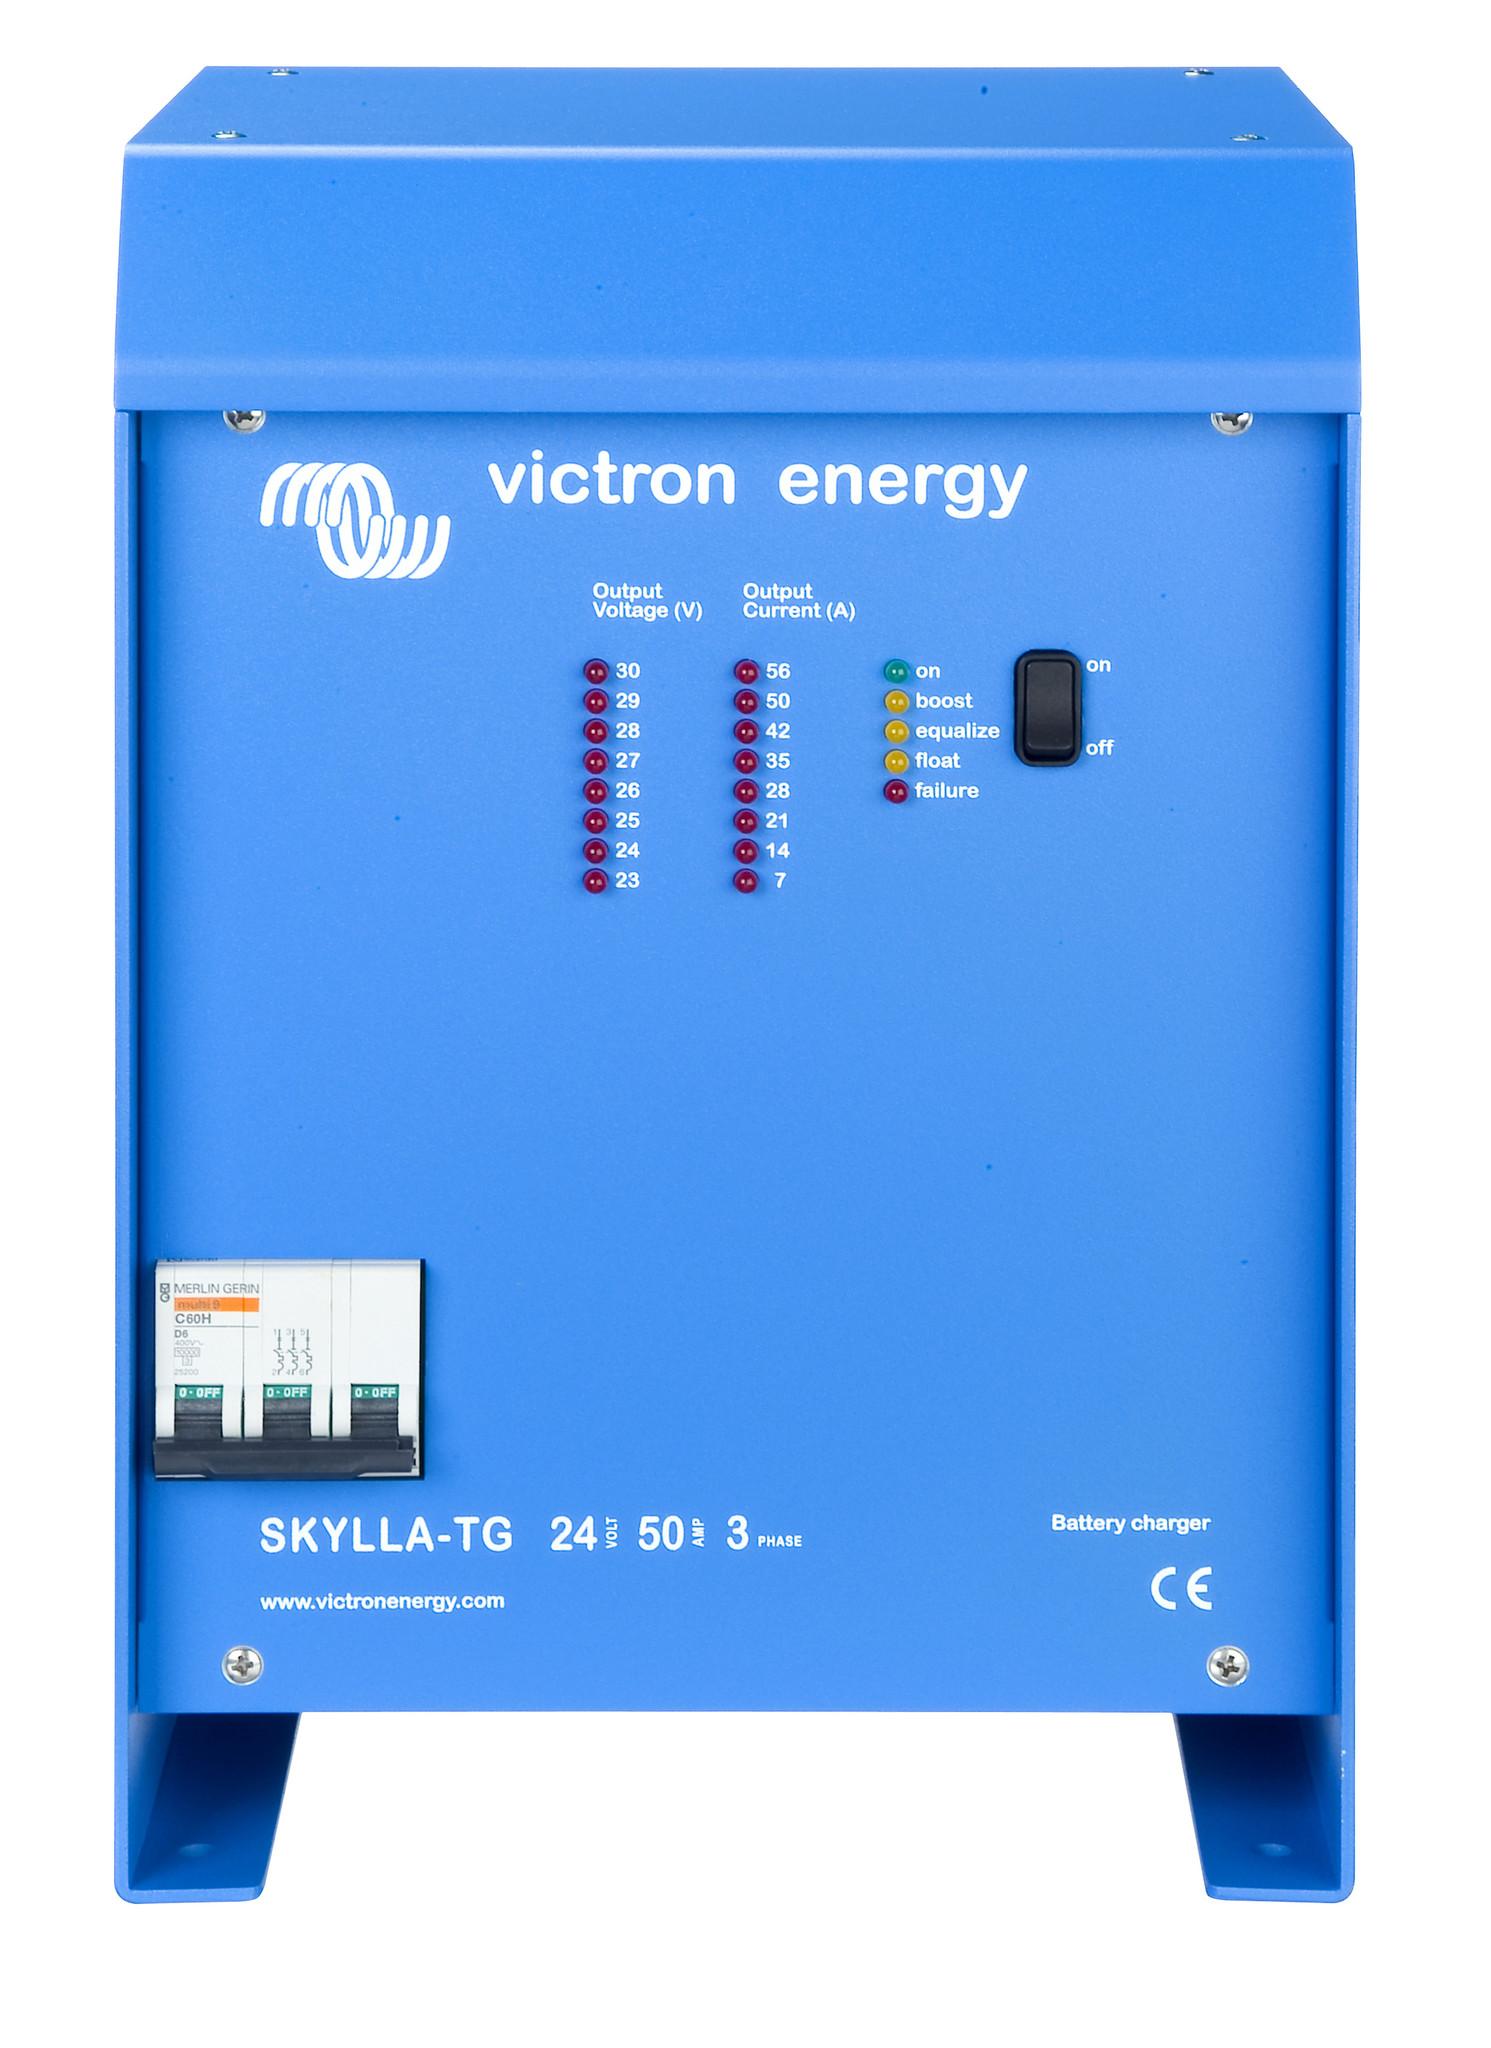 Victron Energy Skylla-TG Charger GMDSS Microprocessor Control